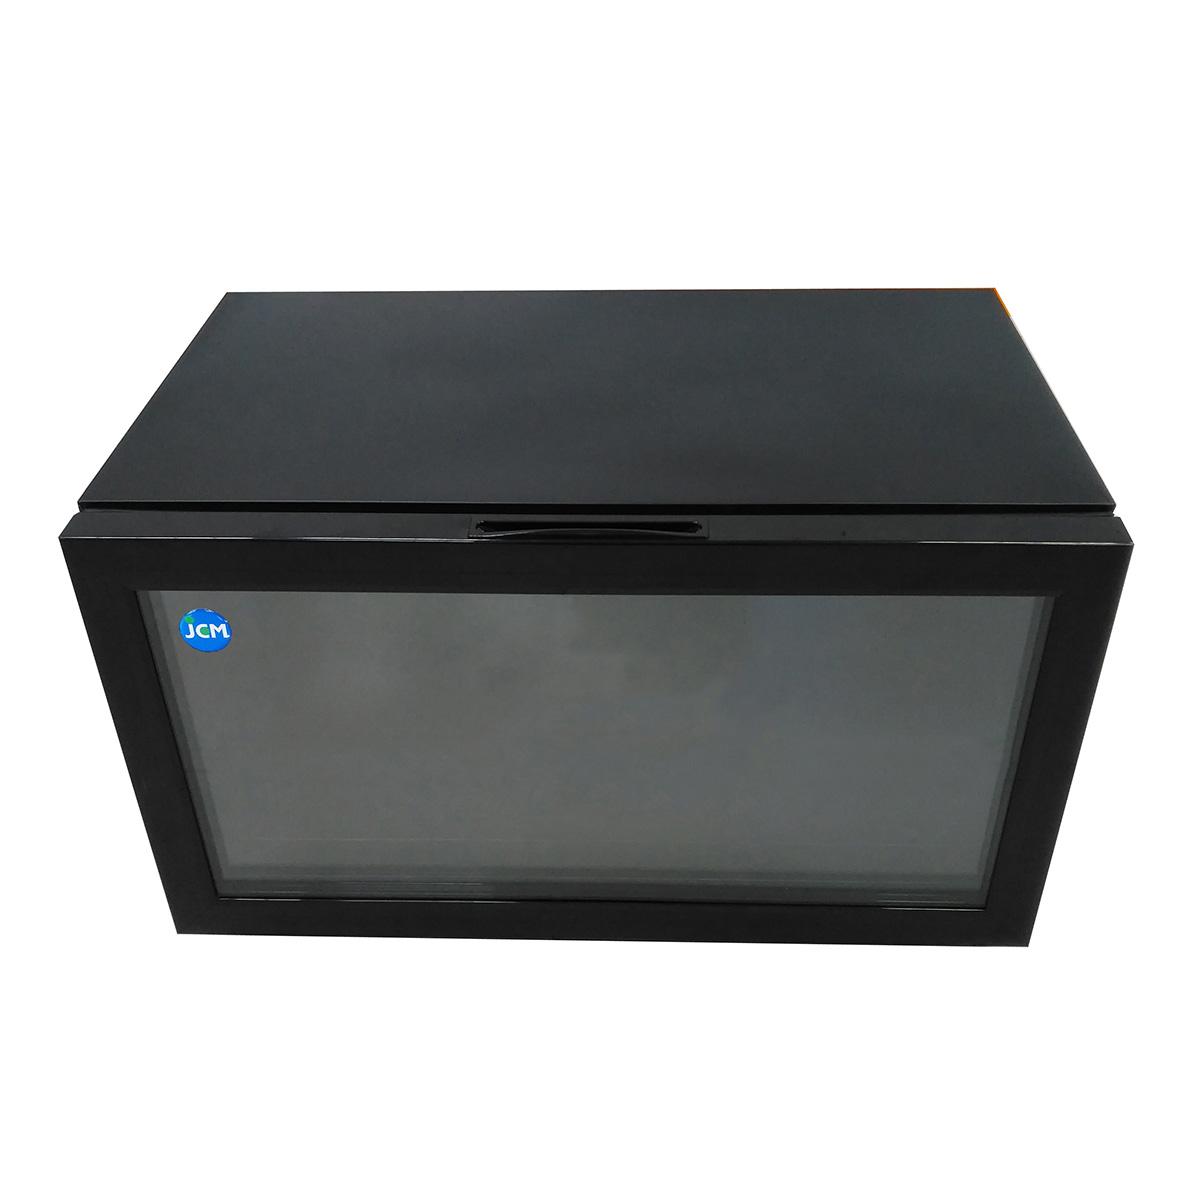 JCM 卓上型冷蔵ショーケース JCMS-36 36L 業務用 冷蔵 保冷庫 ショーケース 卓上型 【代引不可】